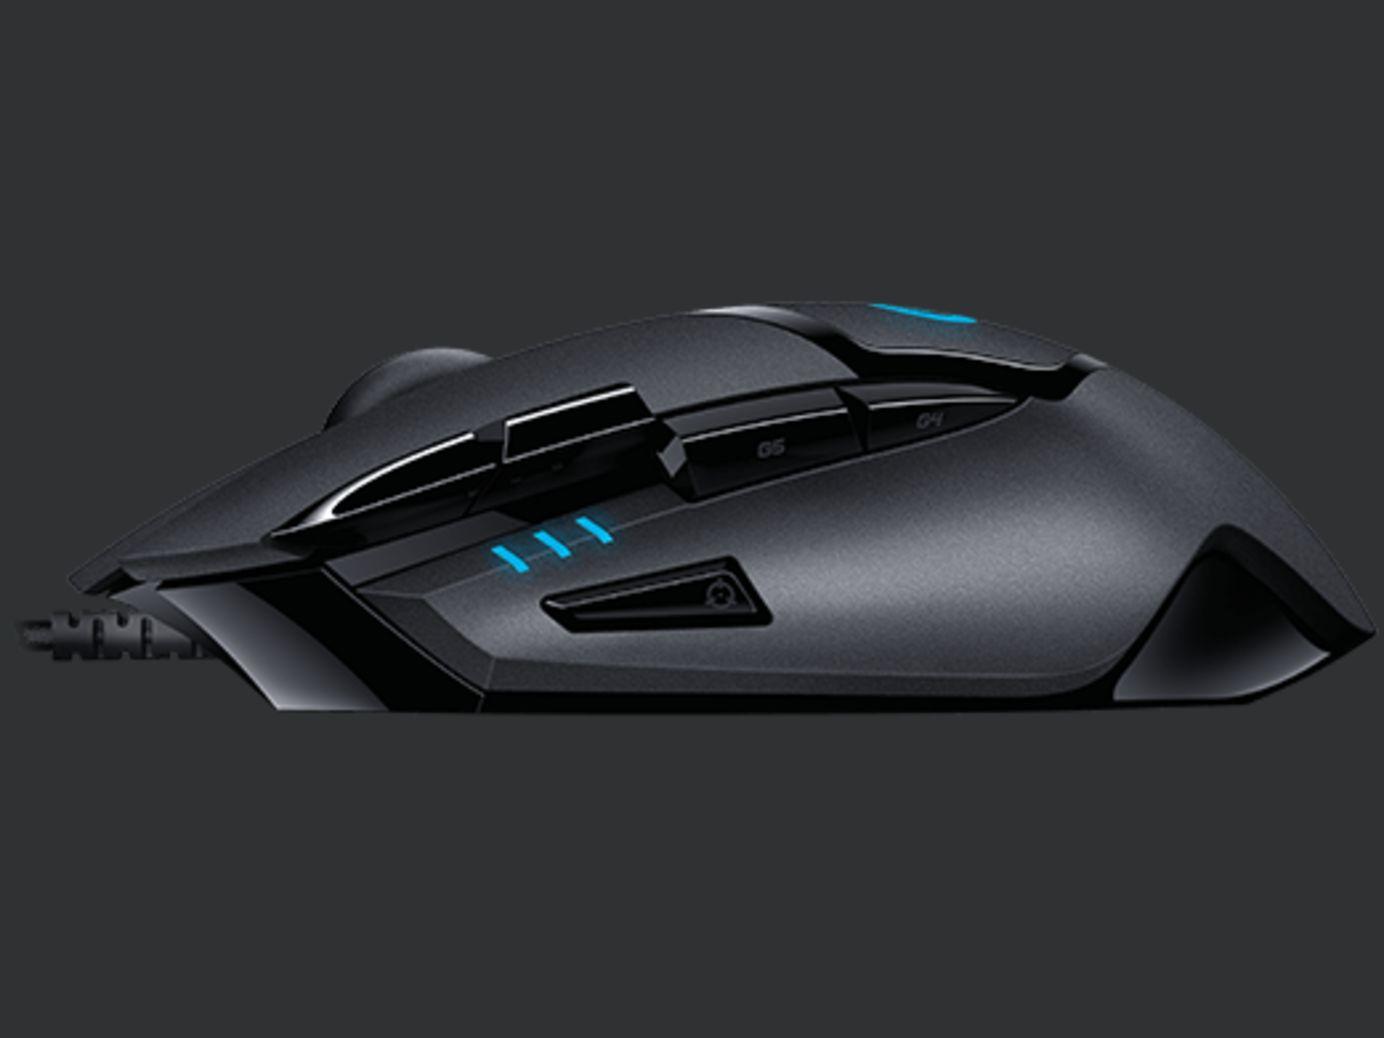 myš Logitech G402 Hyperion Fury